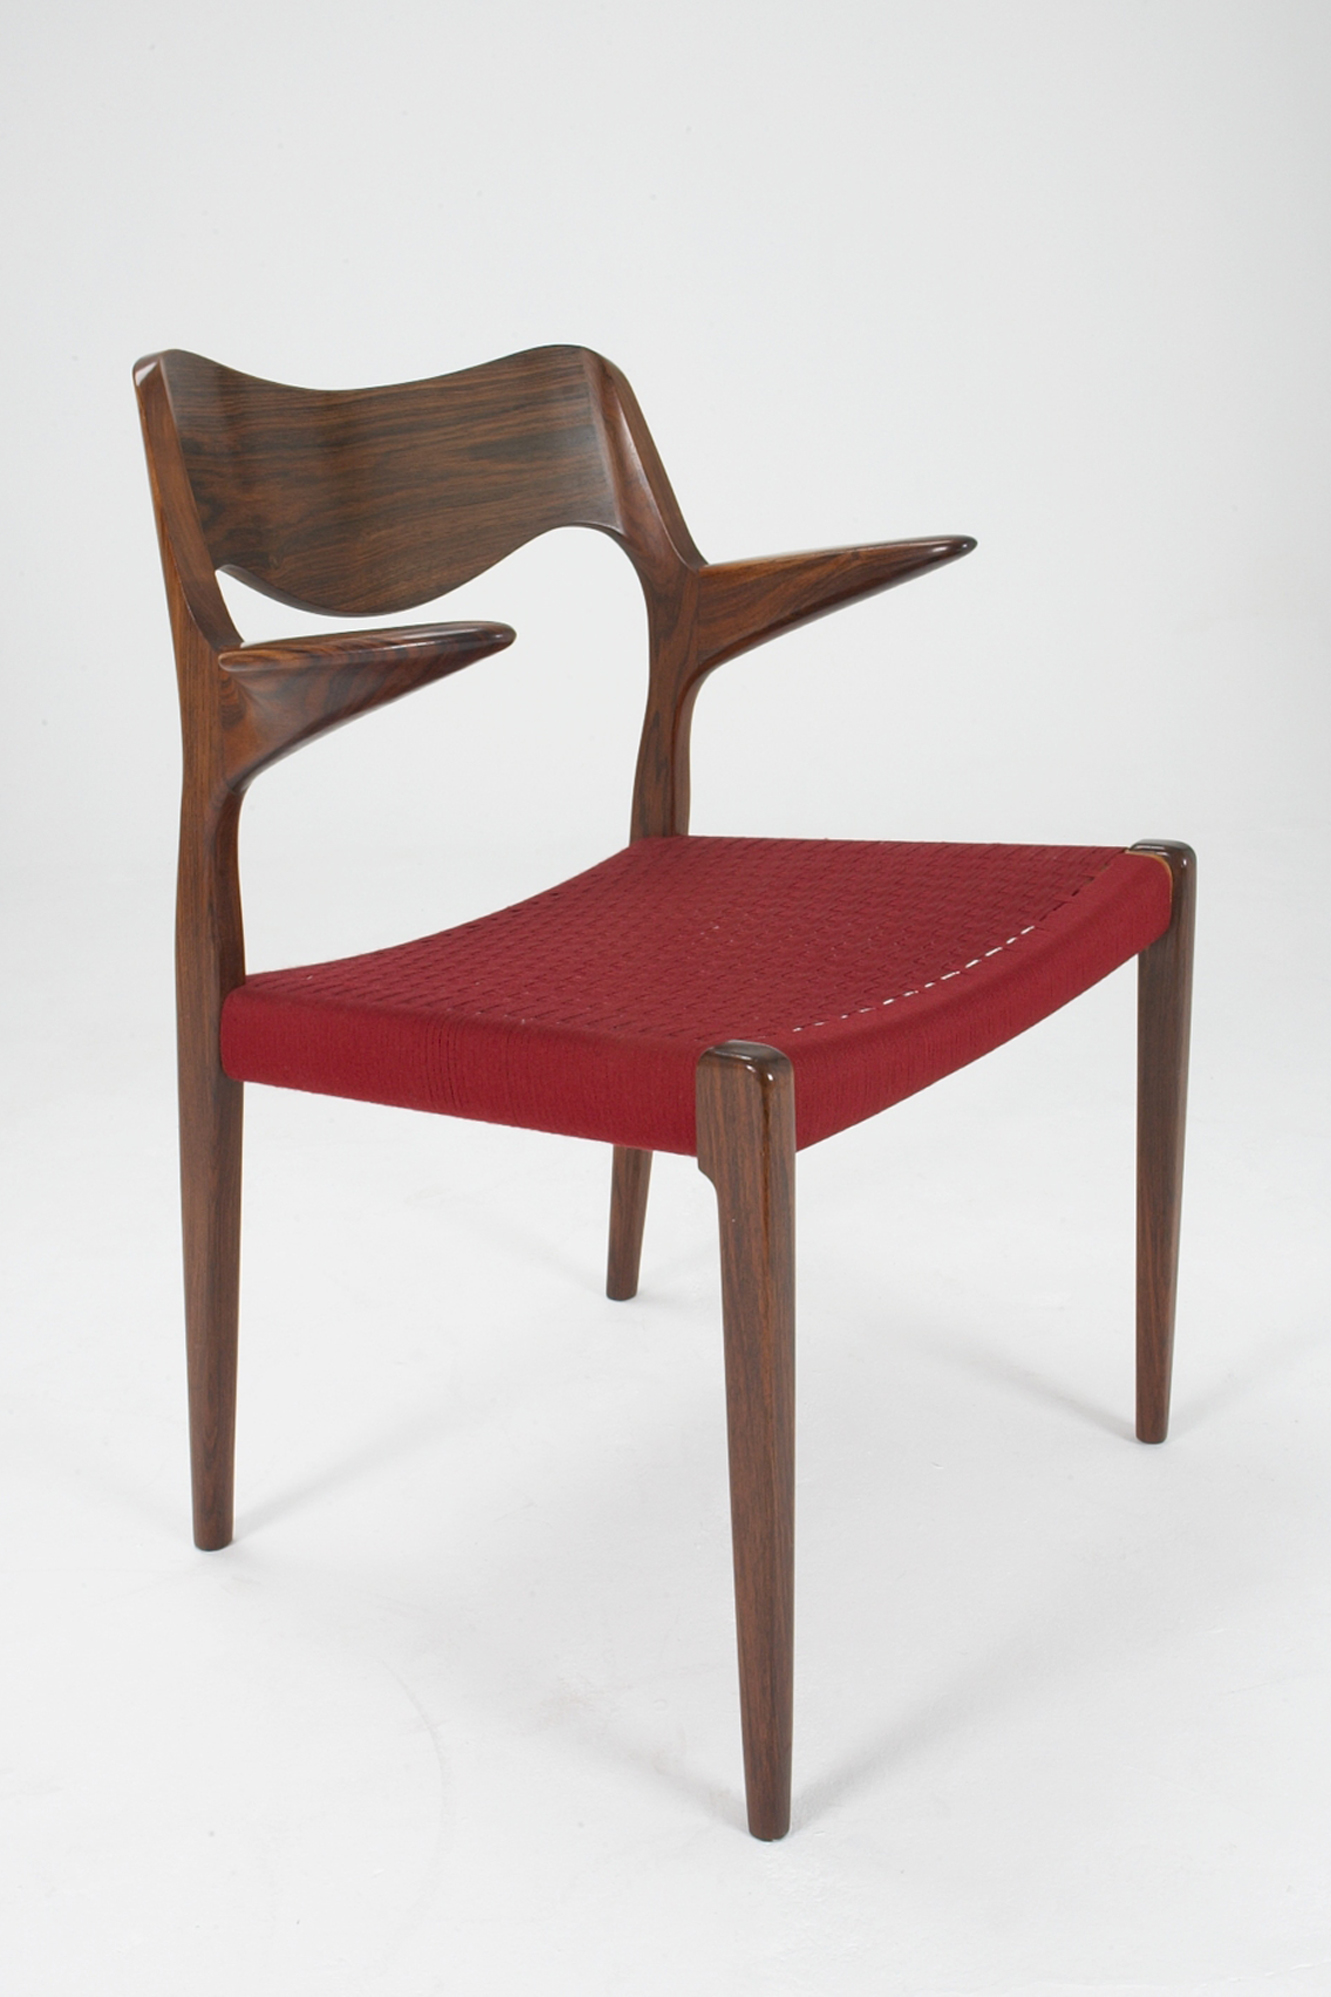 N O Moller 1951 Carver   • made 1951-69    •